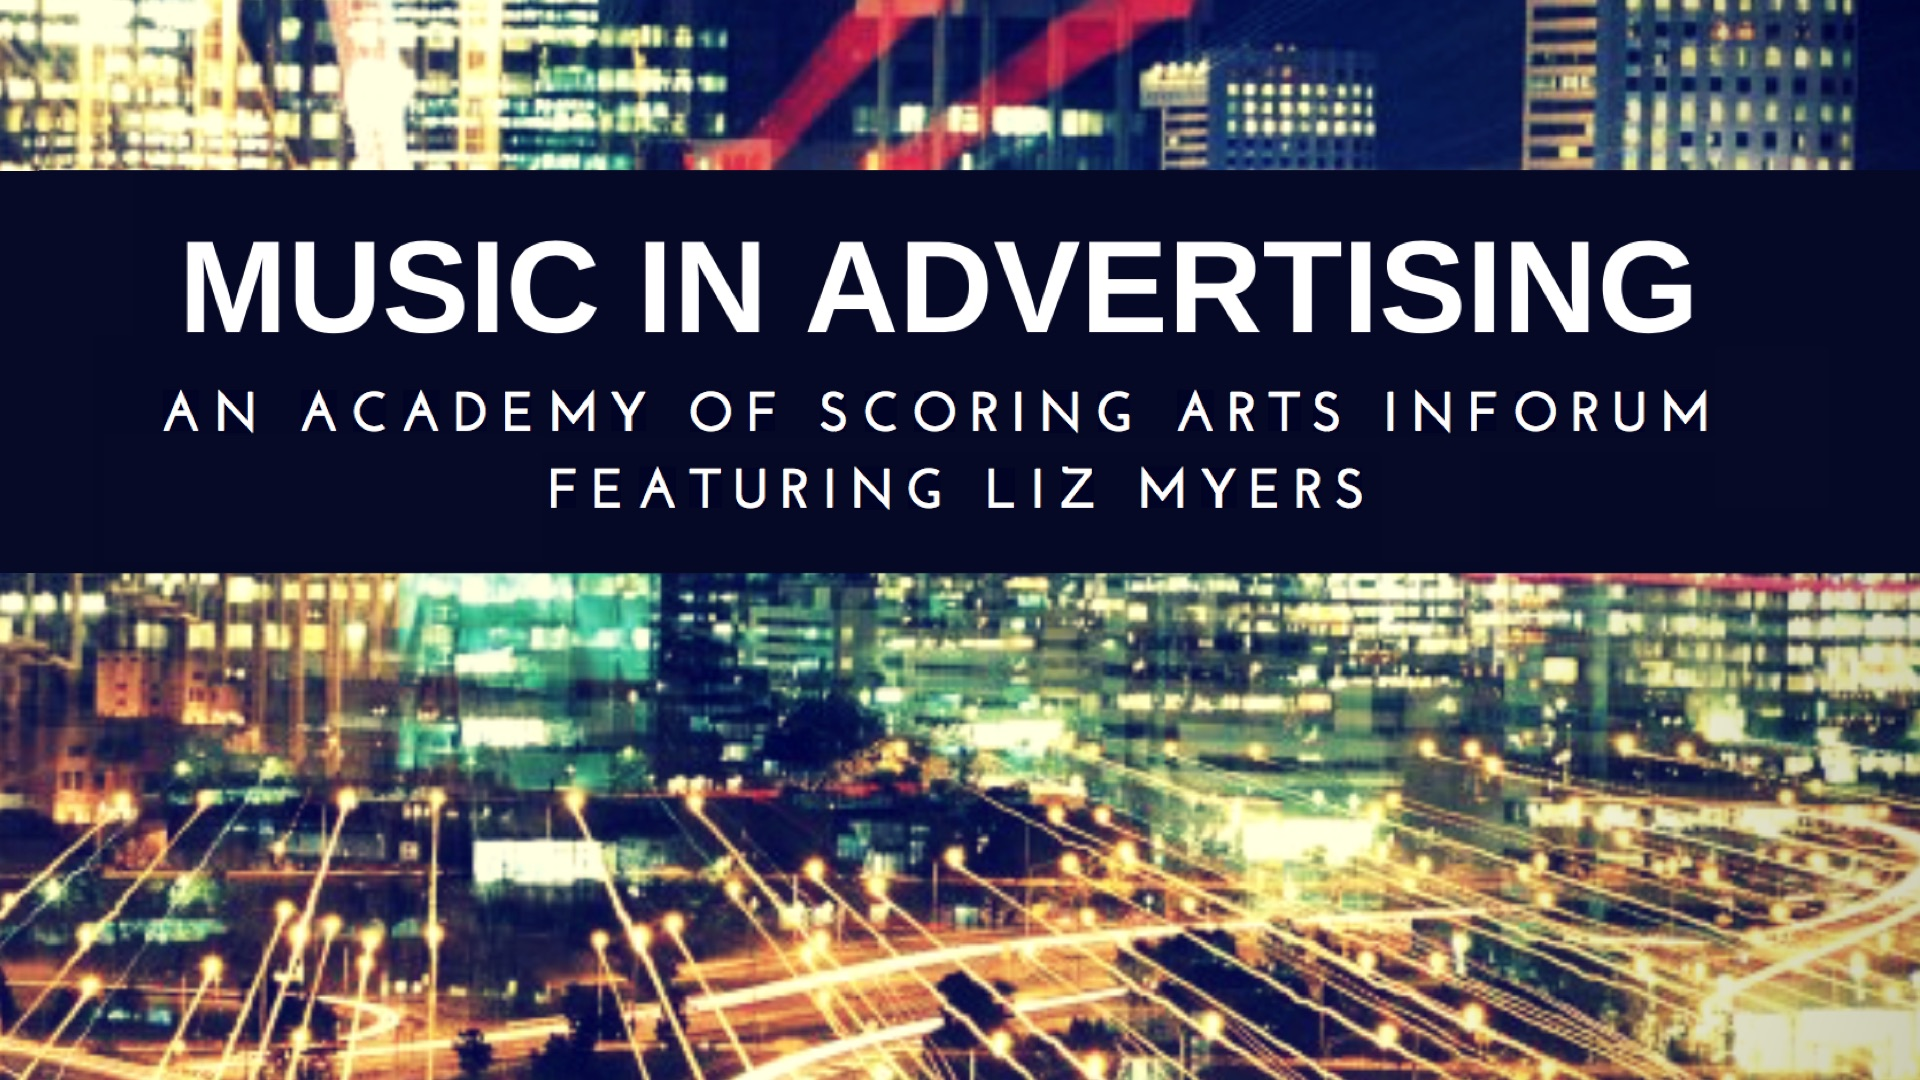 Music in Advertising 1080p